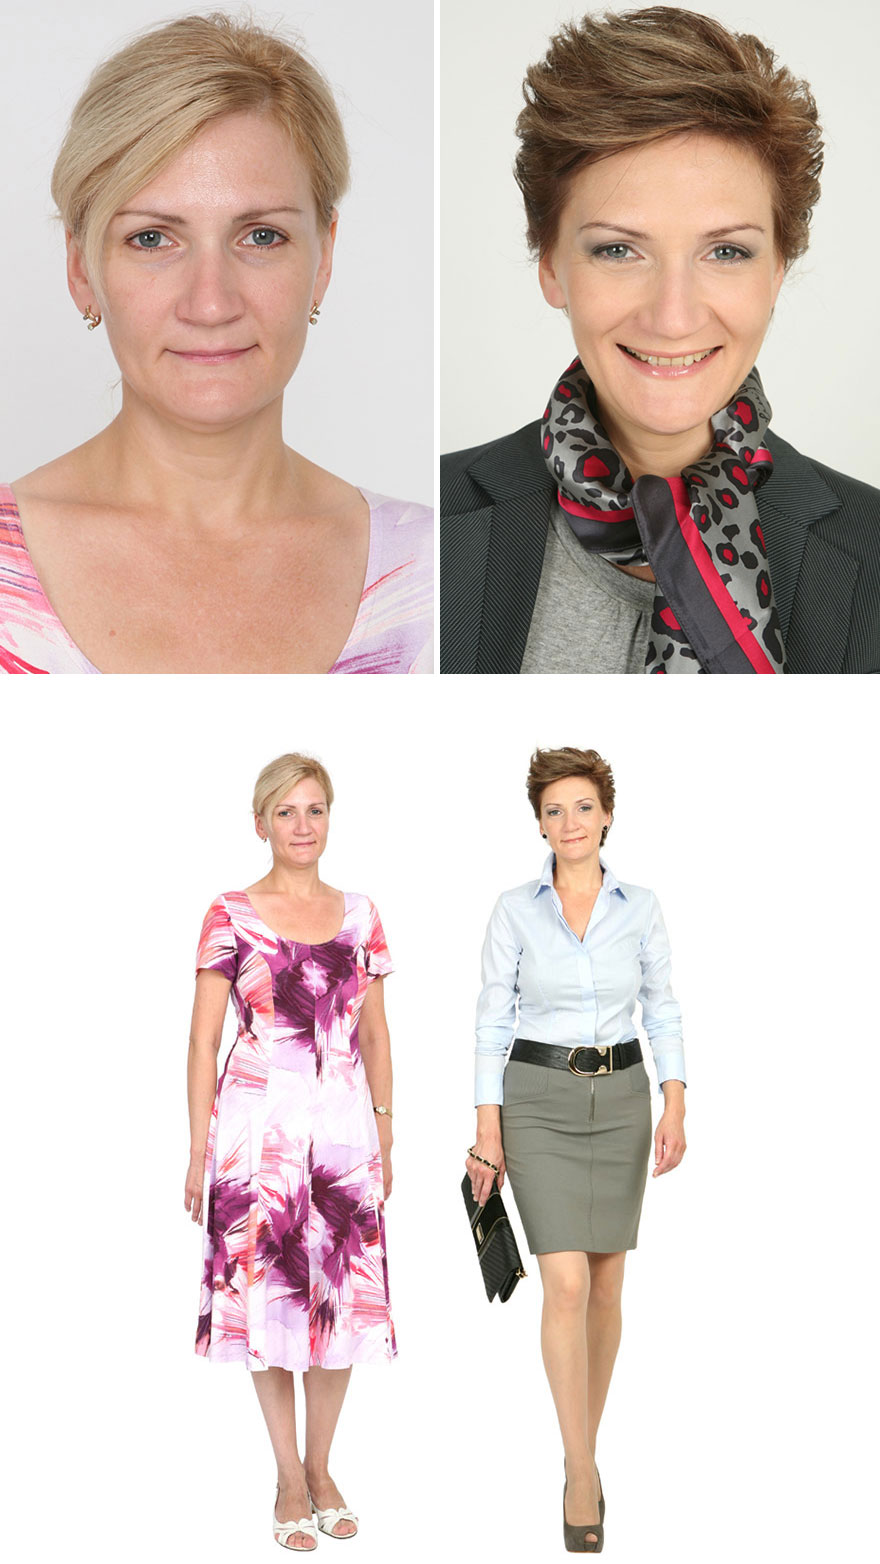 before-after-makeup-woman-style-change-konstantin-bogomolov-10